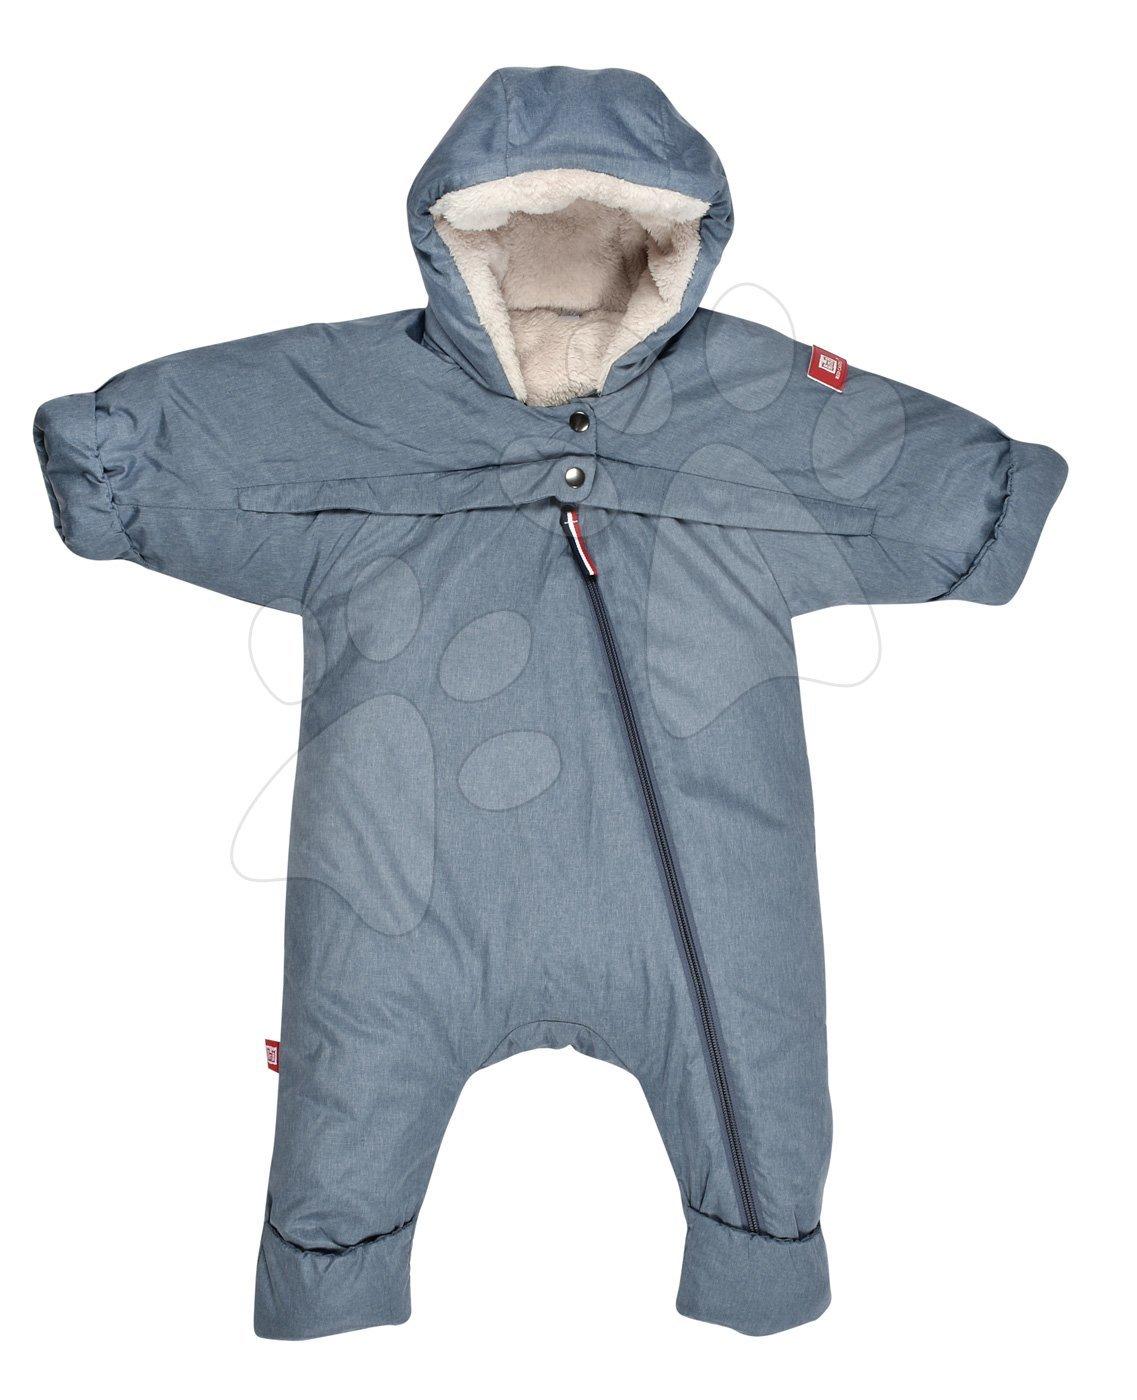 Dojčenské kombinézy - Dojčenská kombinéza overal Red Castle Tenderness T-zip od 0-6 mesiacov teplá vzdušná vodeodolná modrá